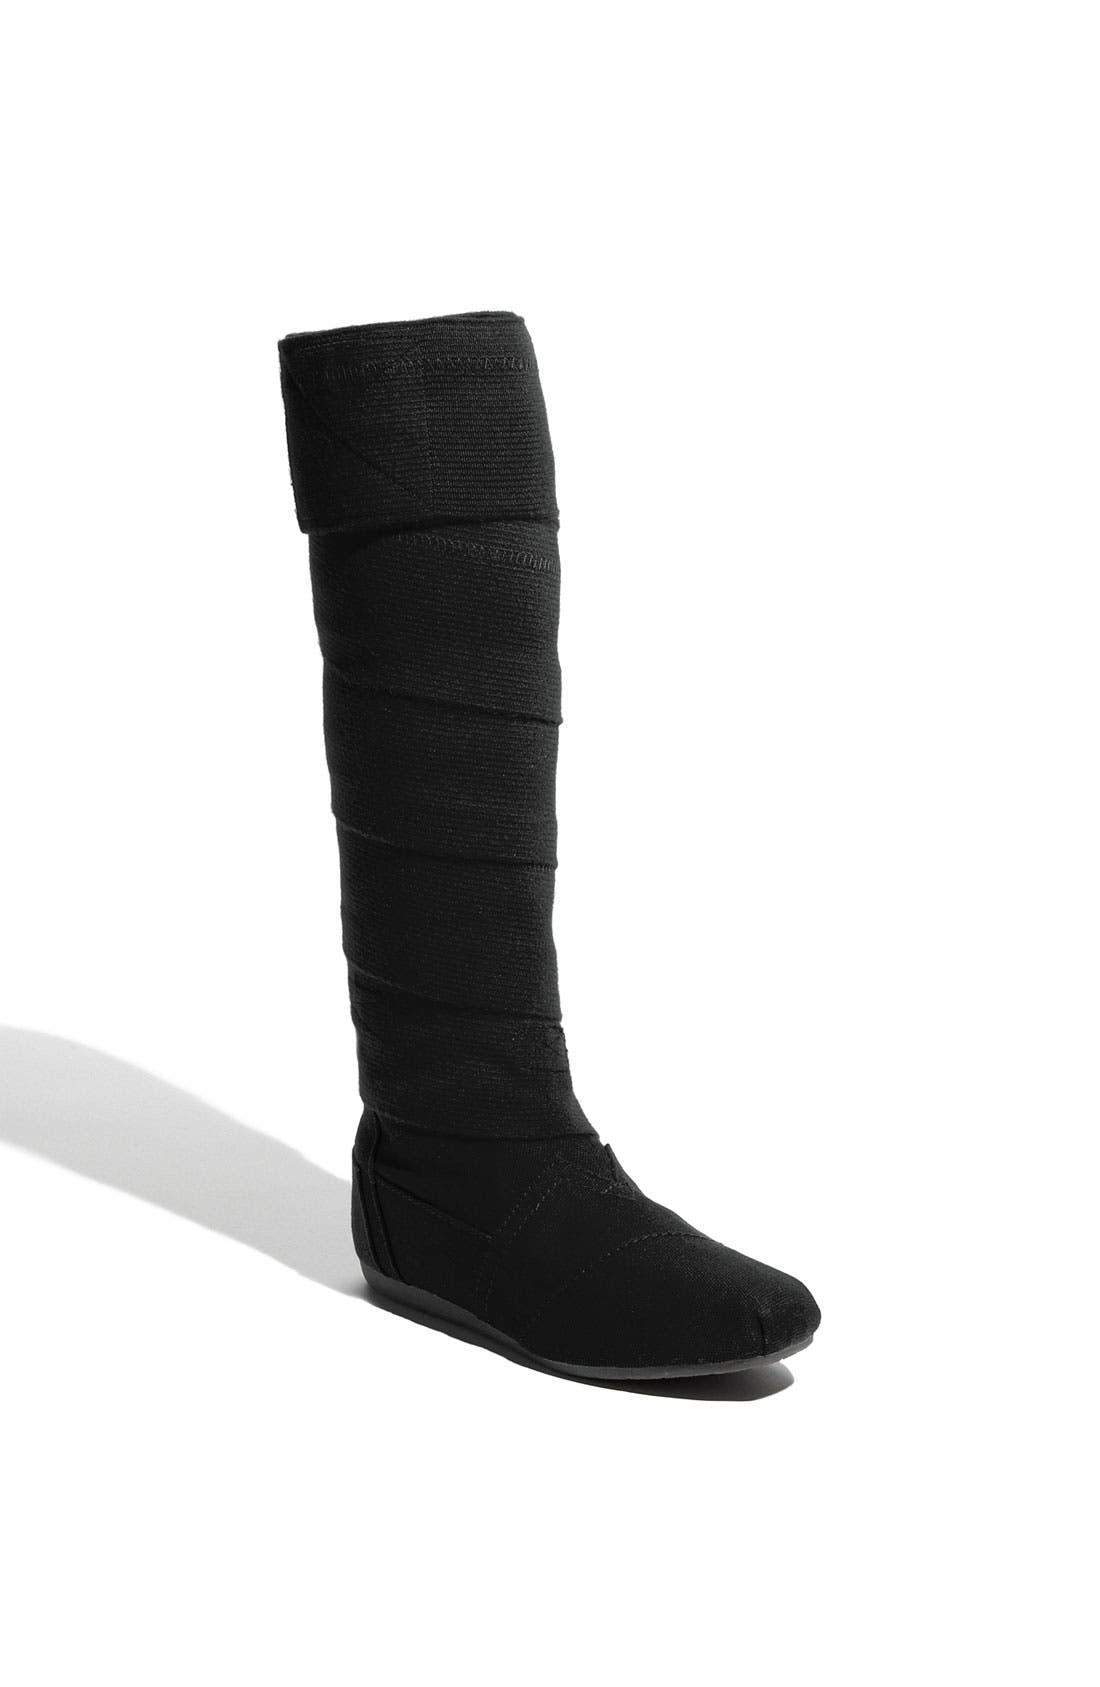 'Wrap' Boot,                             Main thumbnail 1, color,                             001